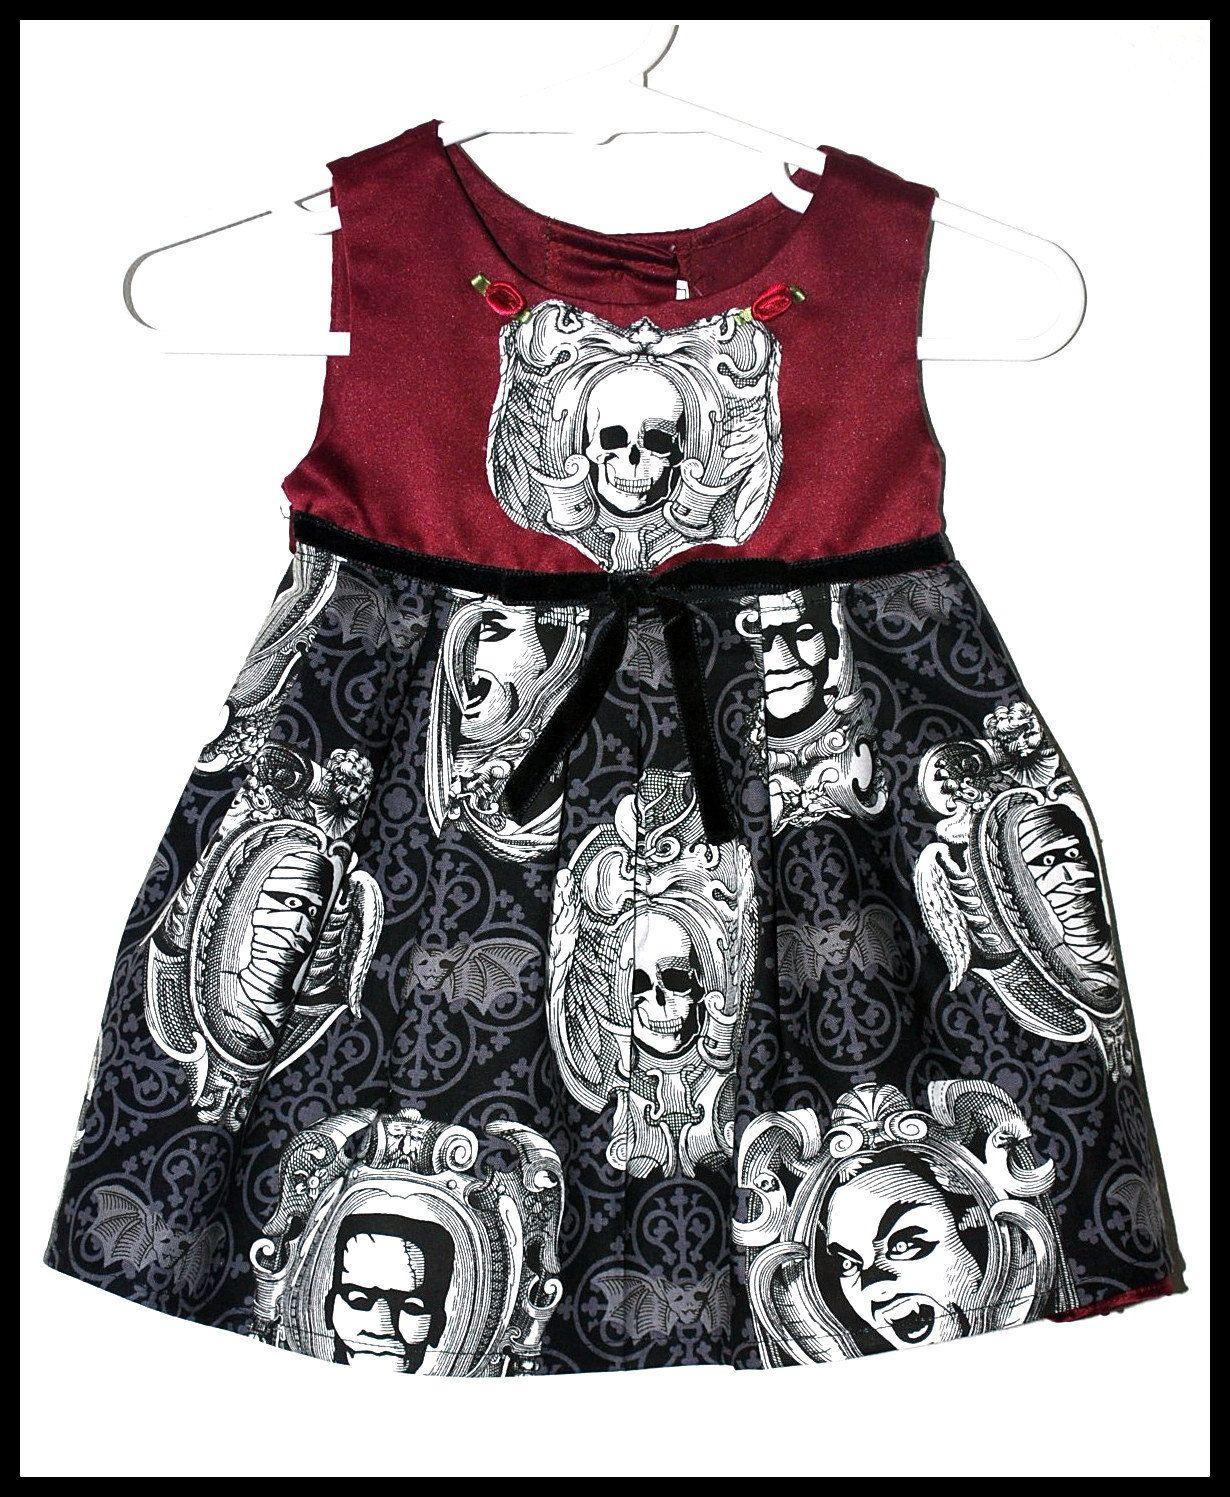 c538c3c50cf Girls Rockabilly Gothic Dress in Burgundy   Monster Cameos ... Size 3-6  months girls by DollfaceBettys on Etsy